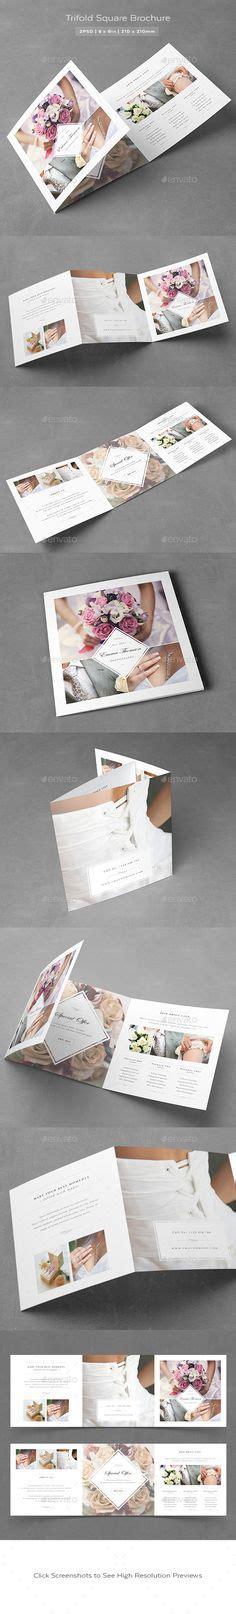 trifold template album ideas 8x8 press printed lay flat album template classic